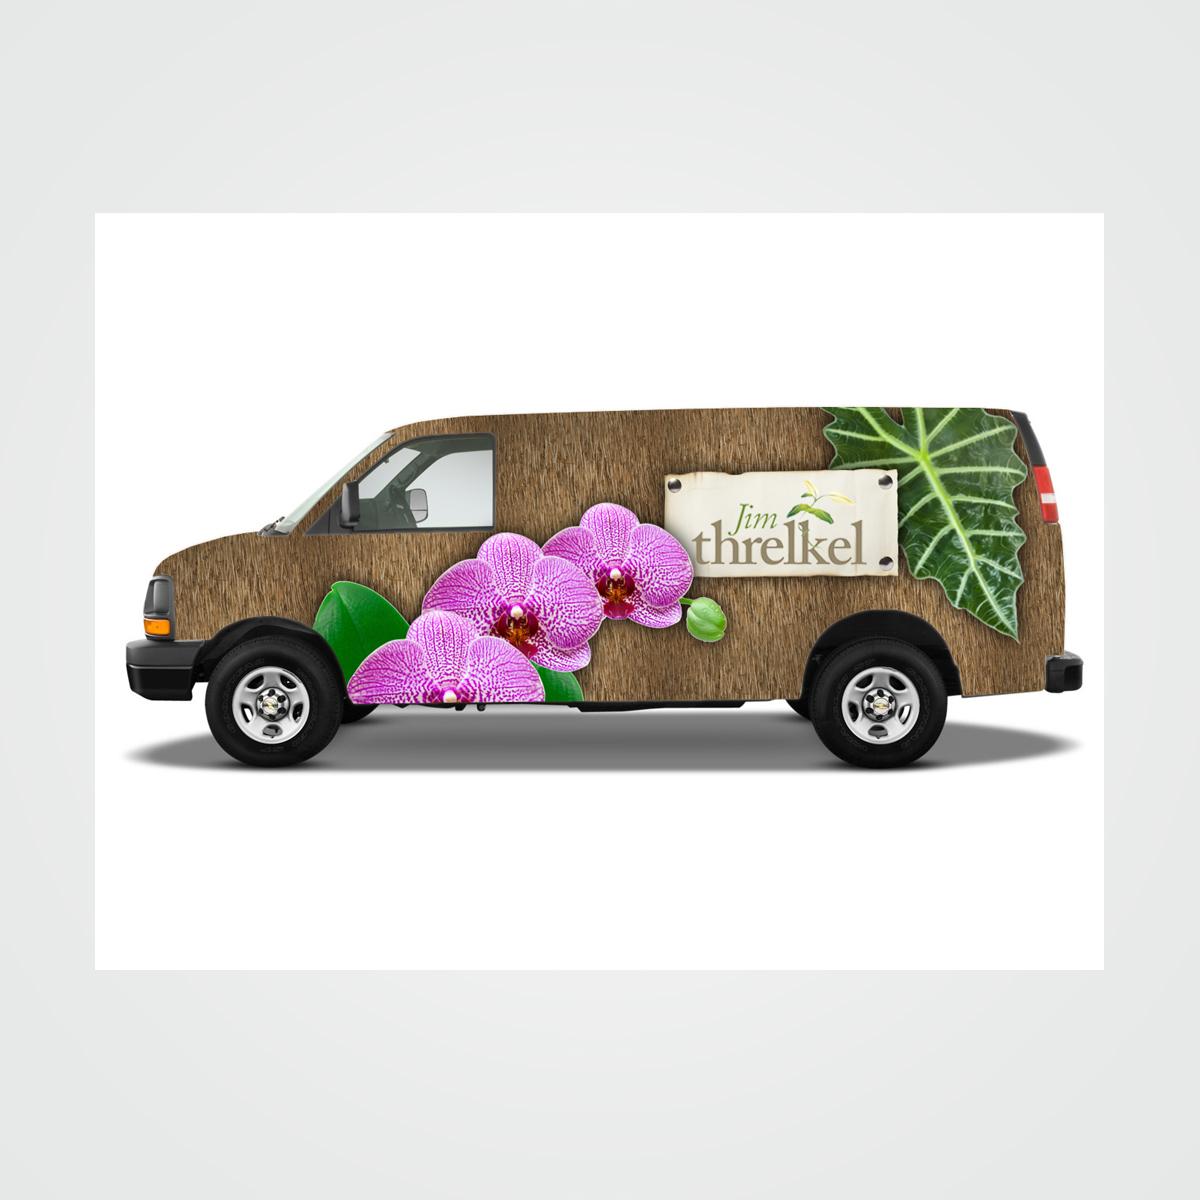 Truck fleet design for Threlkel Florist in Fort Lauderdale